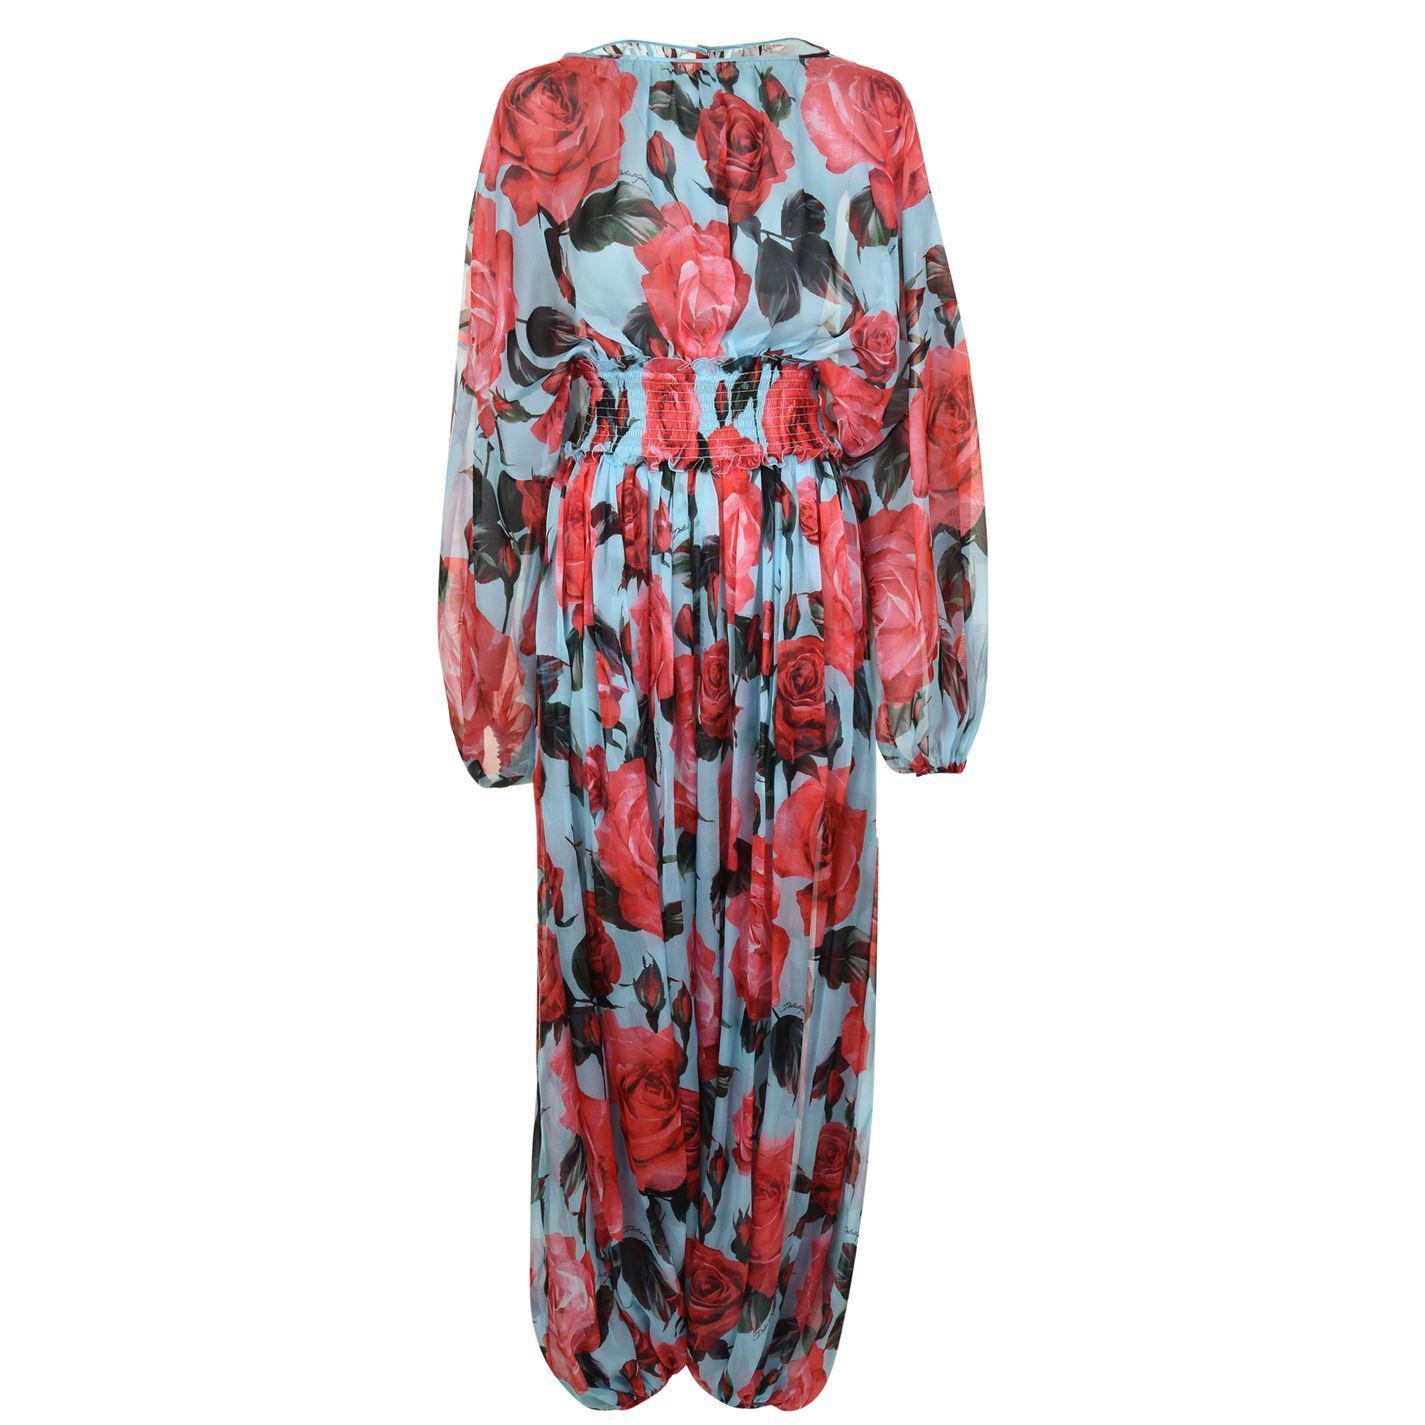 f62b49d9b4 Lyst - Dolce   Gabbana Rose Elasticated Jumpsuit in Red